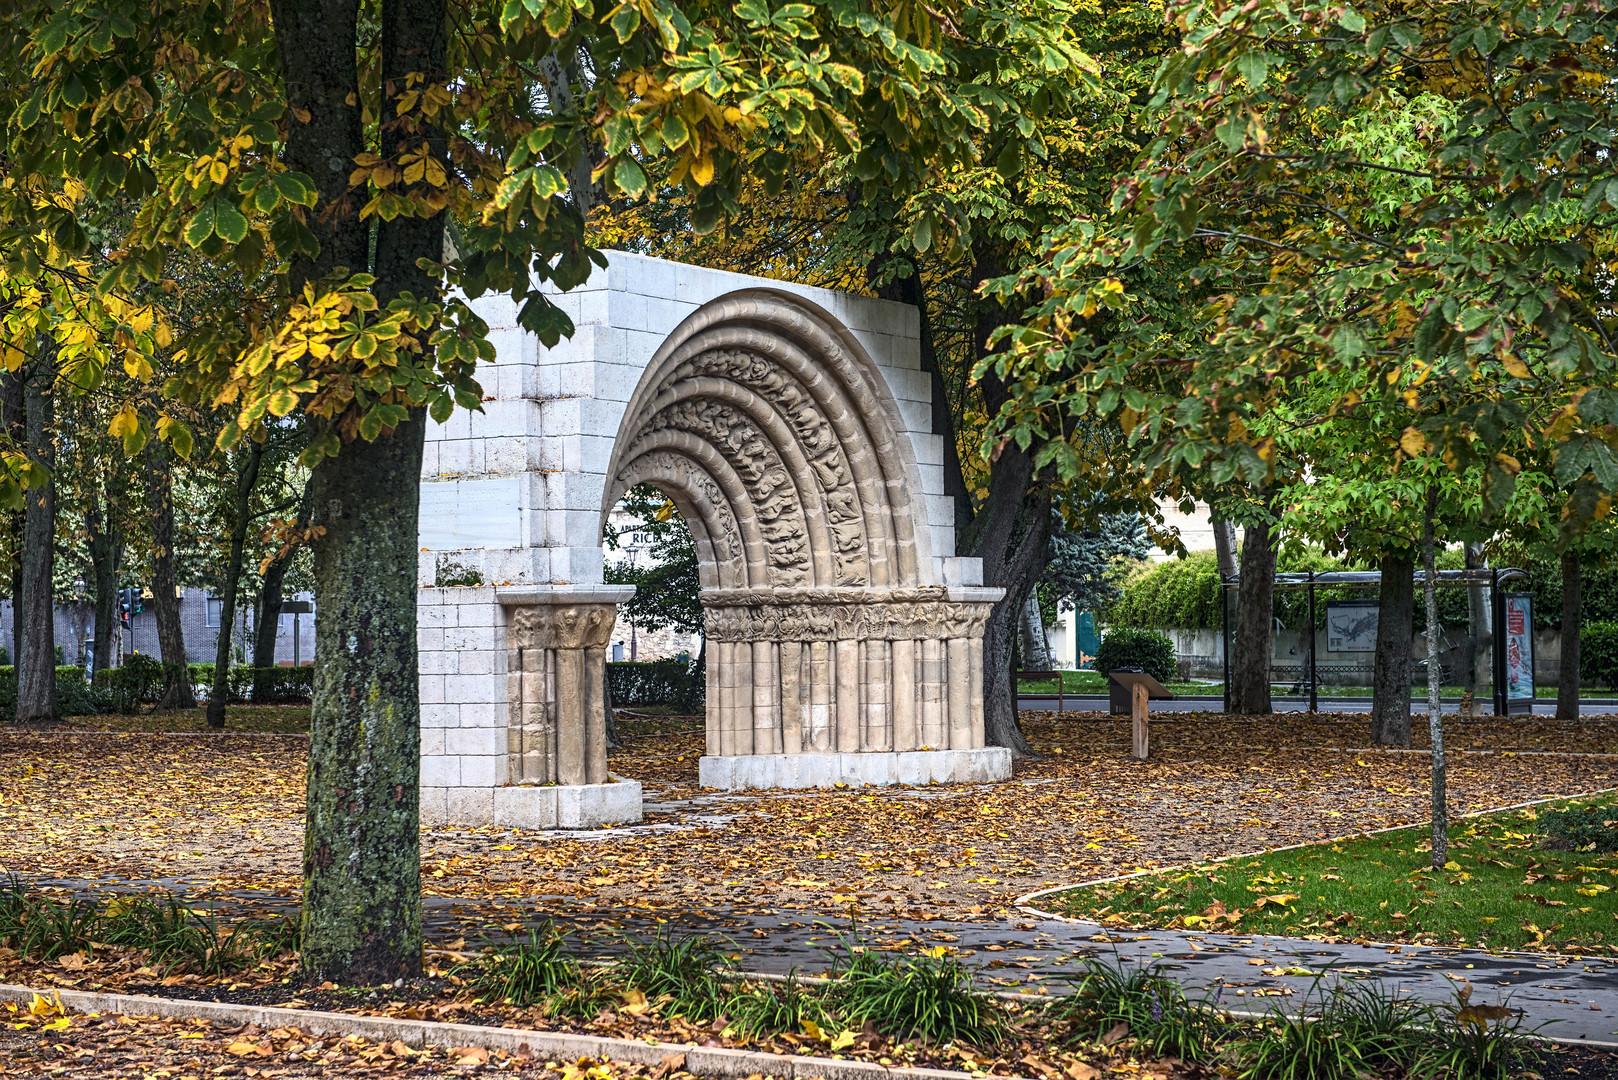 Paseo de otoño en Burgos